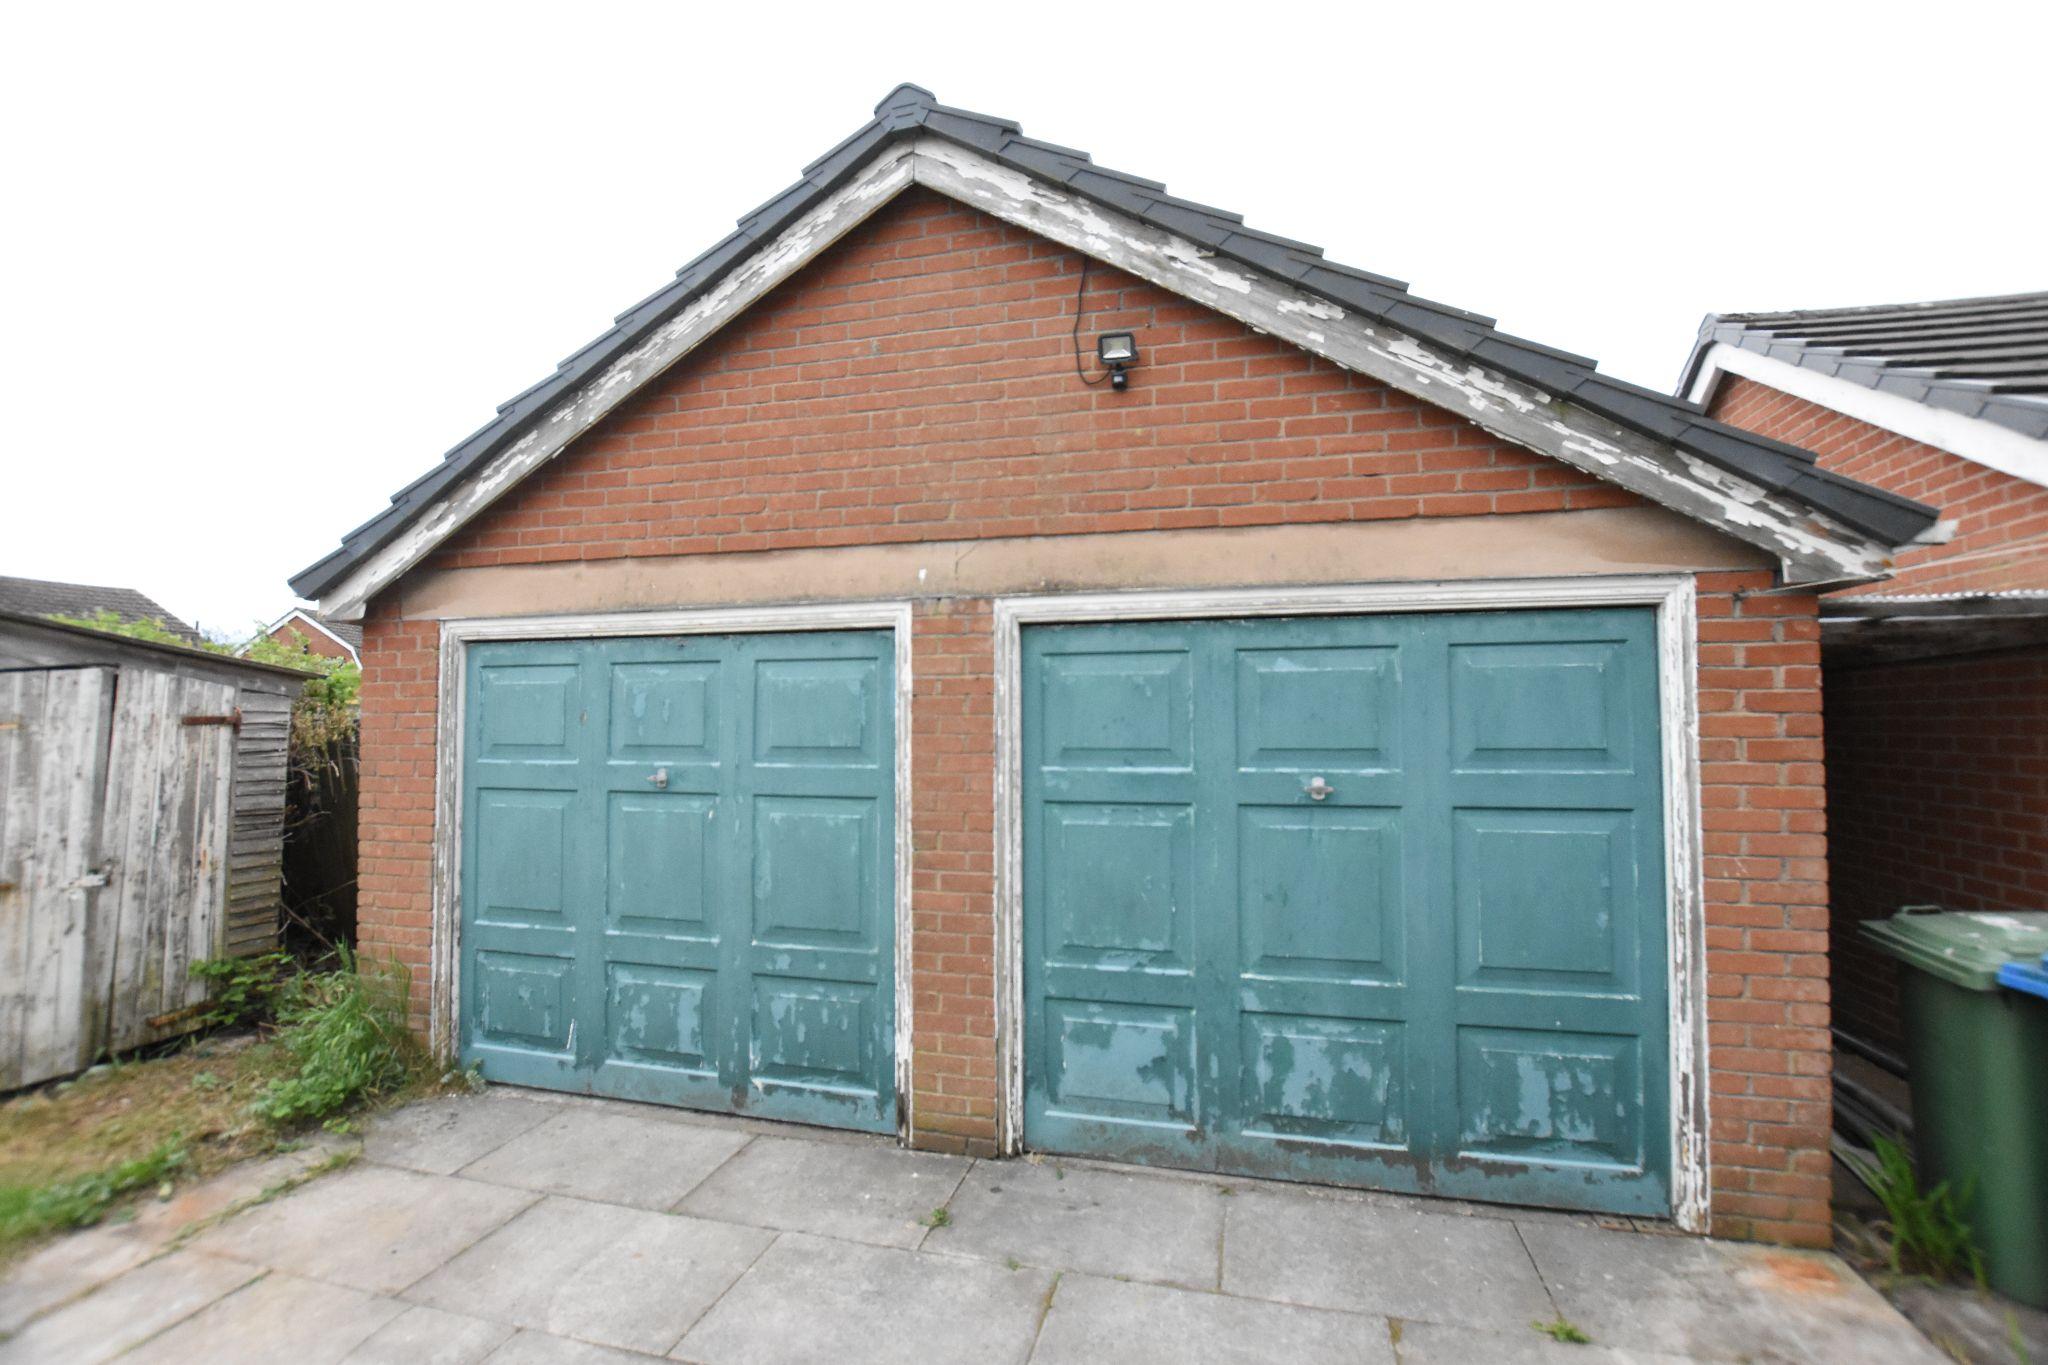 4 bedroom detached house Sold STC in Preston - Garage